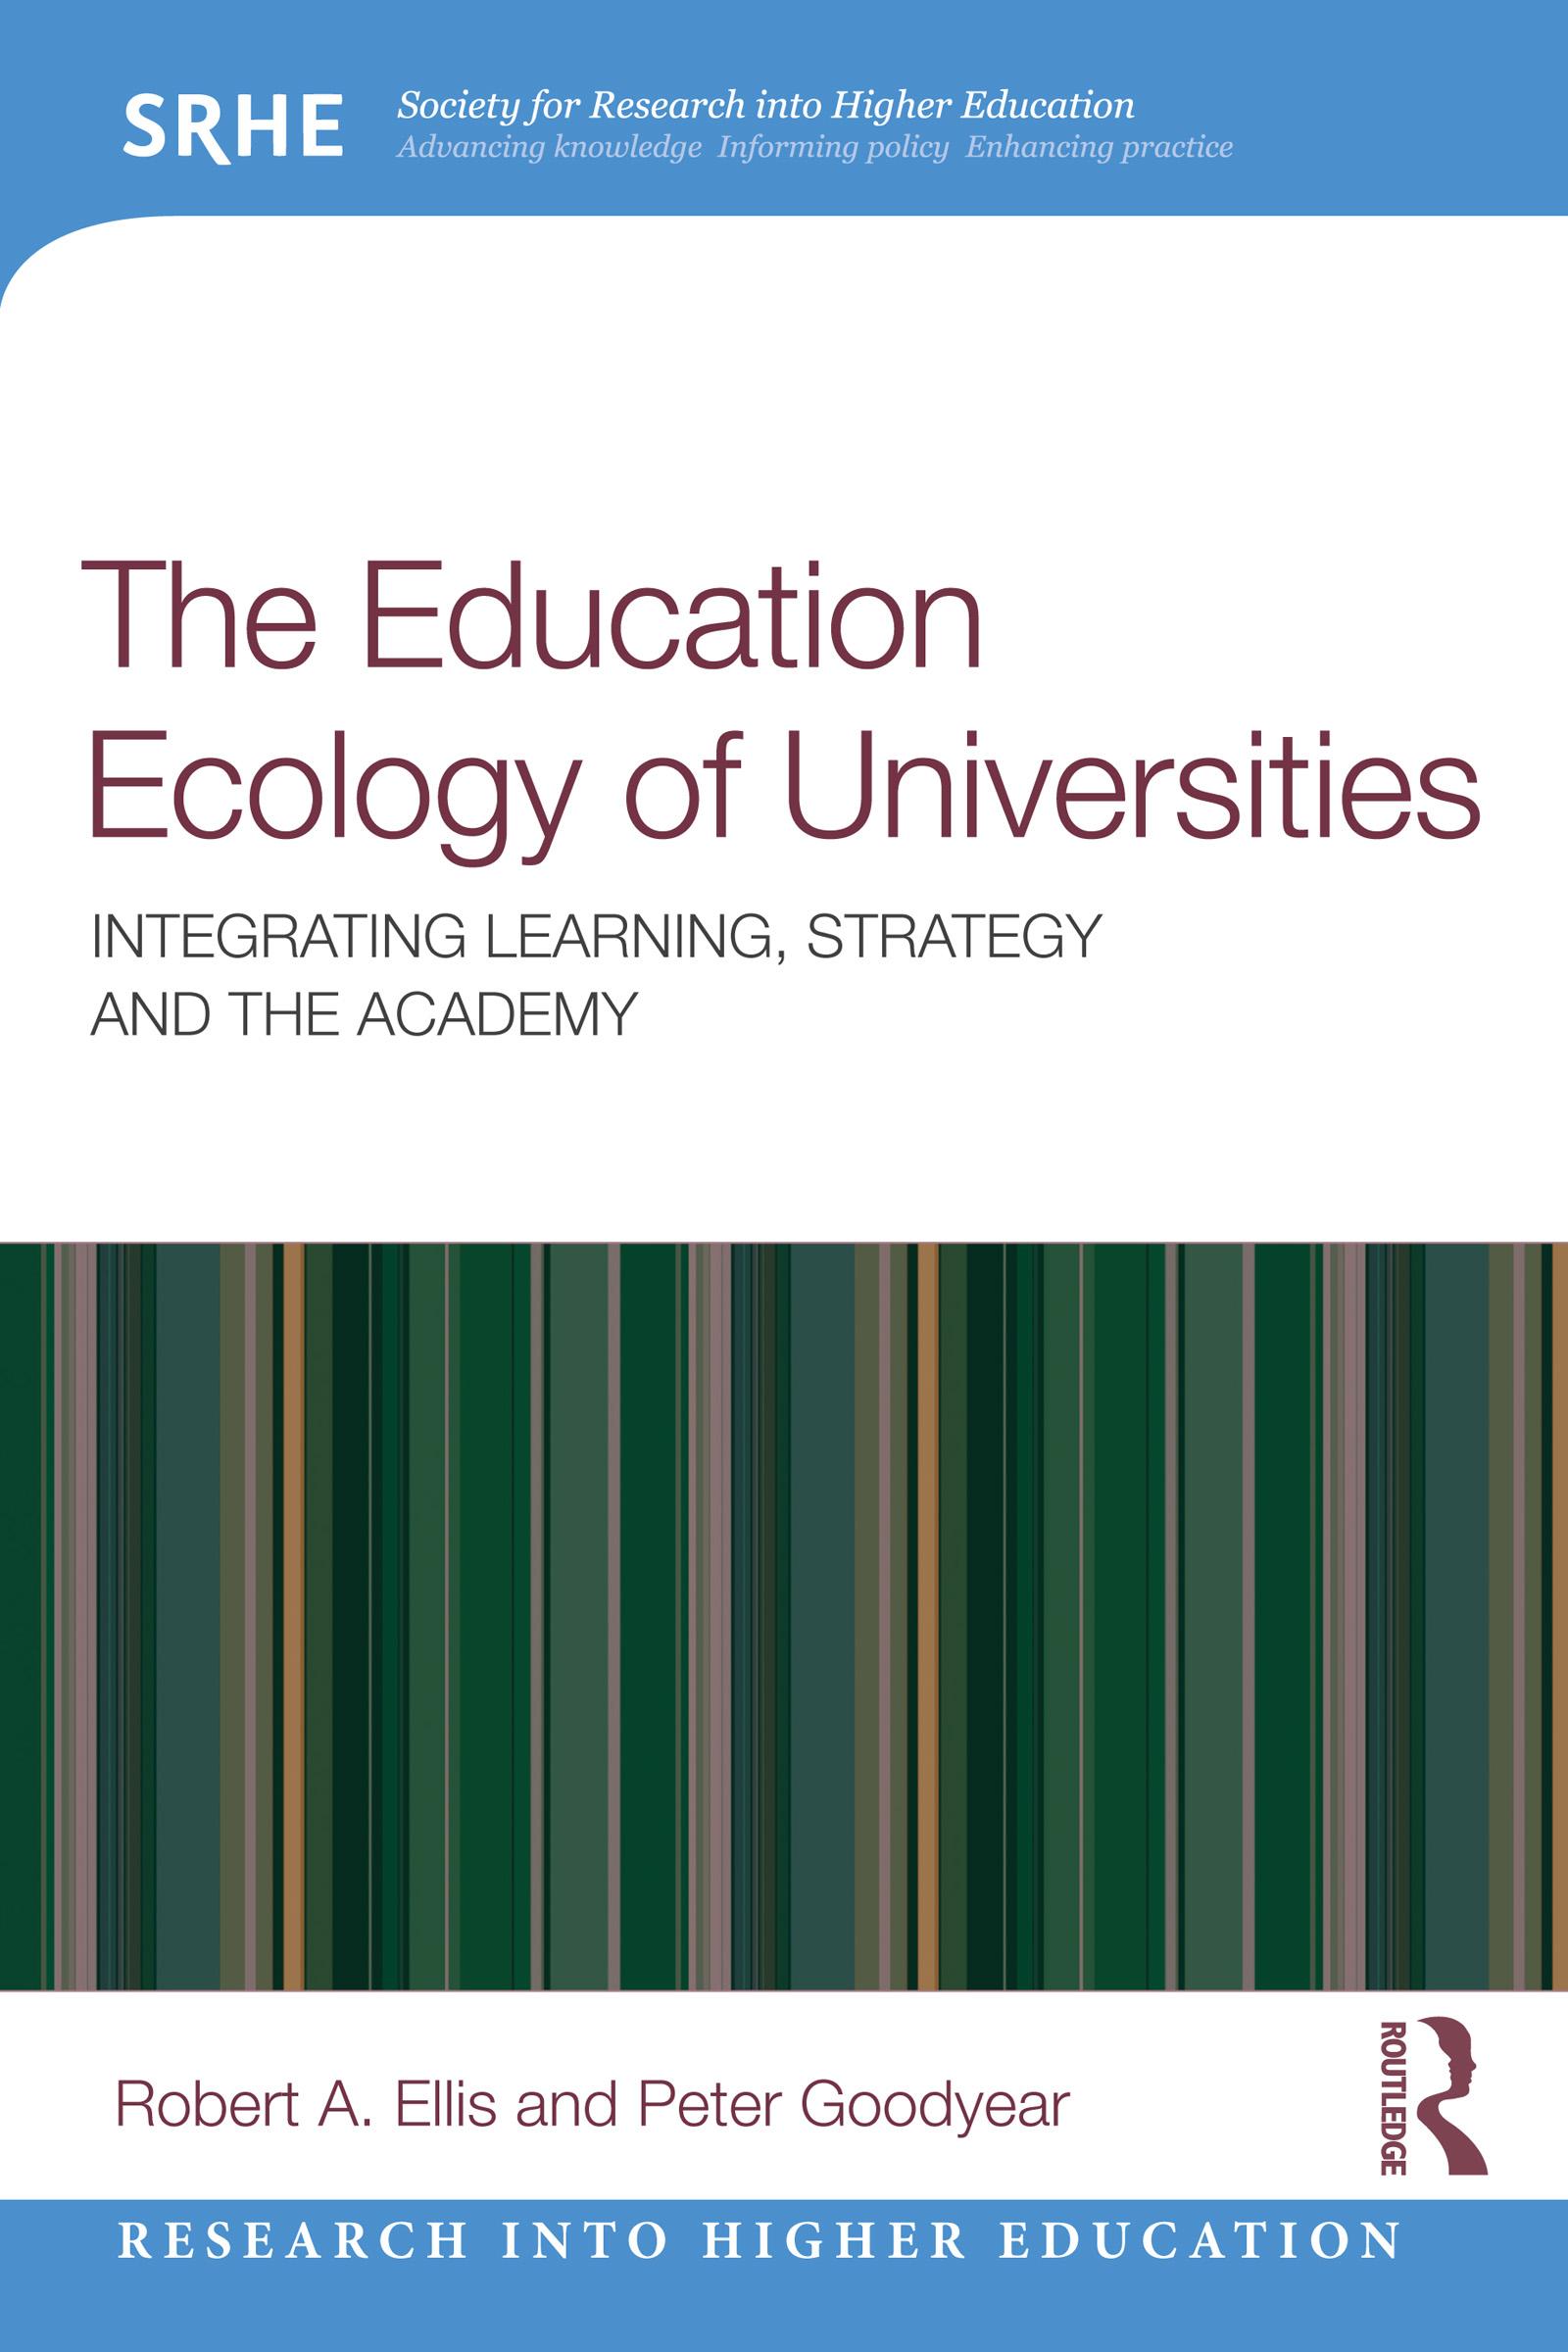 The views of university educational leaders